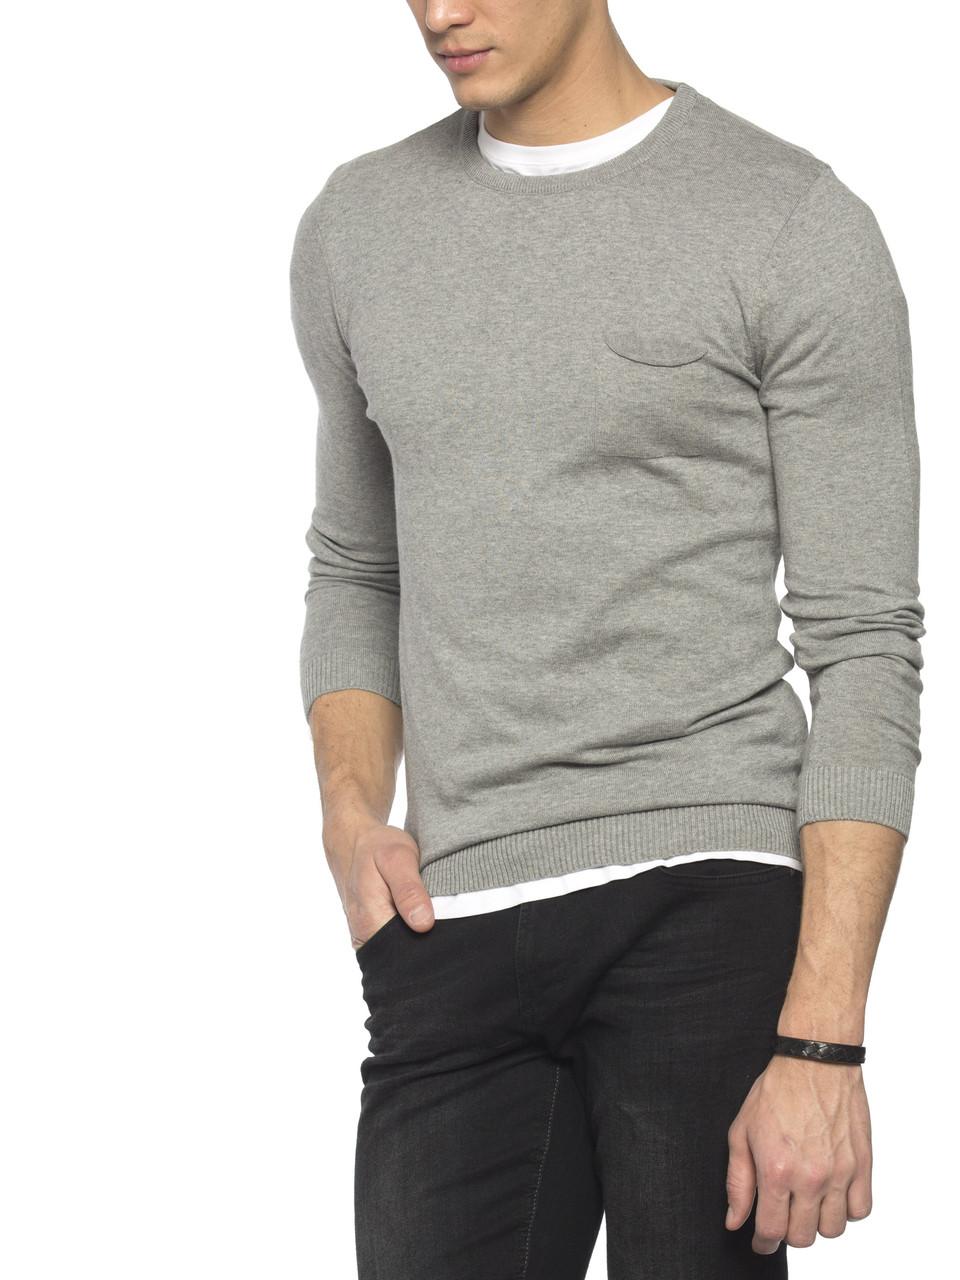 Мужской свитер LC Waikiki светло-серого цвета с карманом на груди